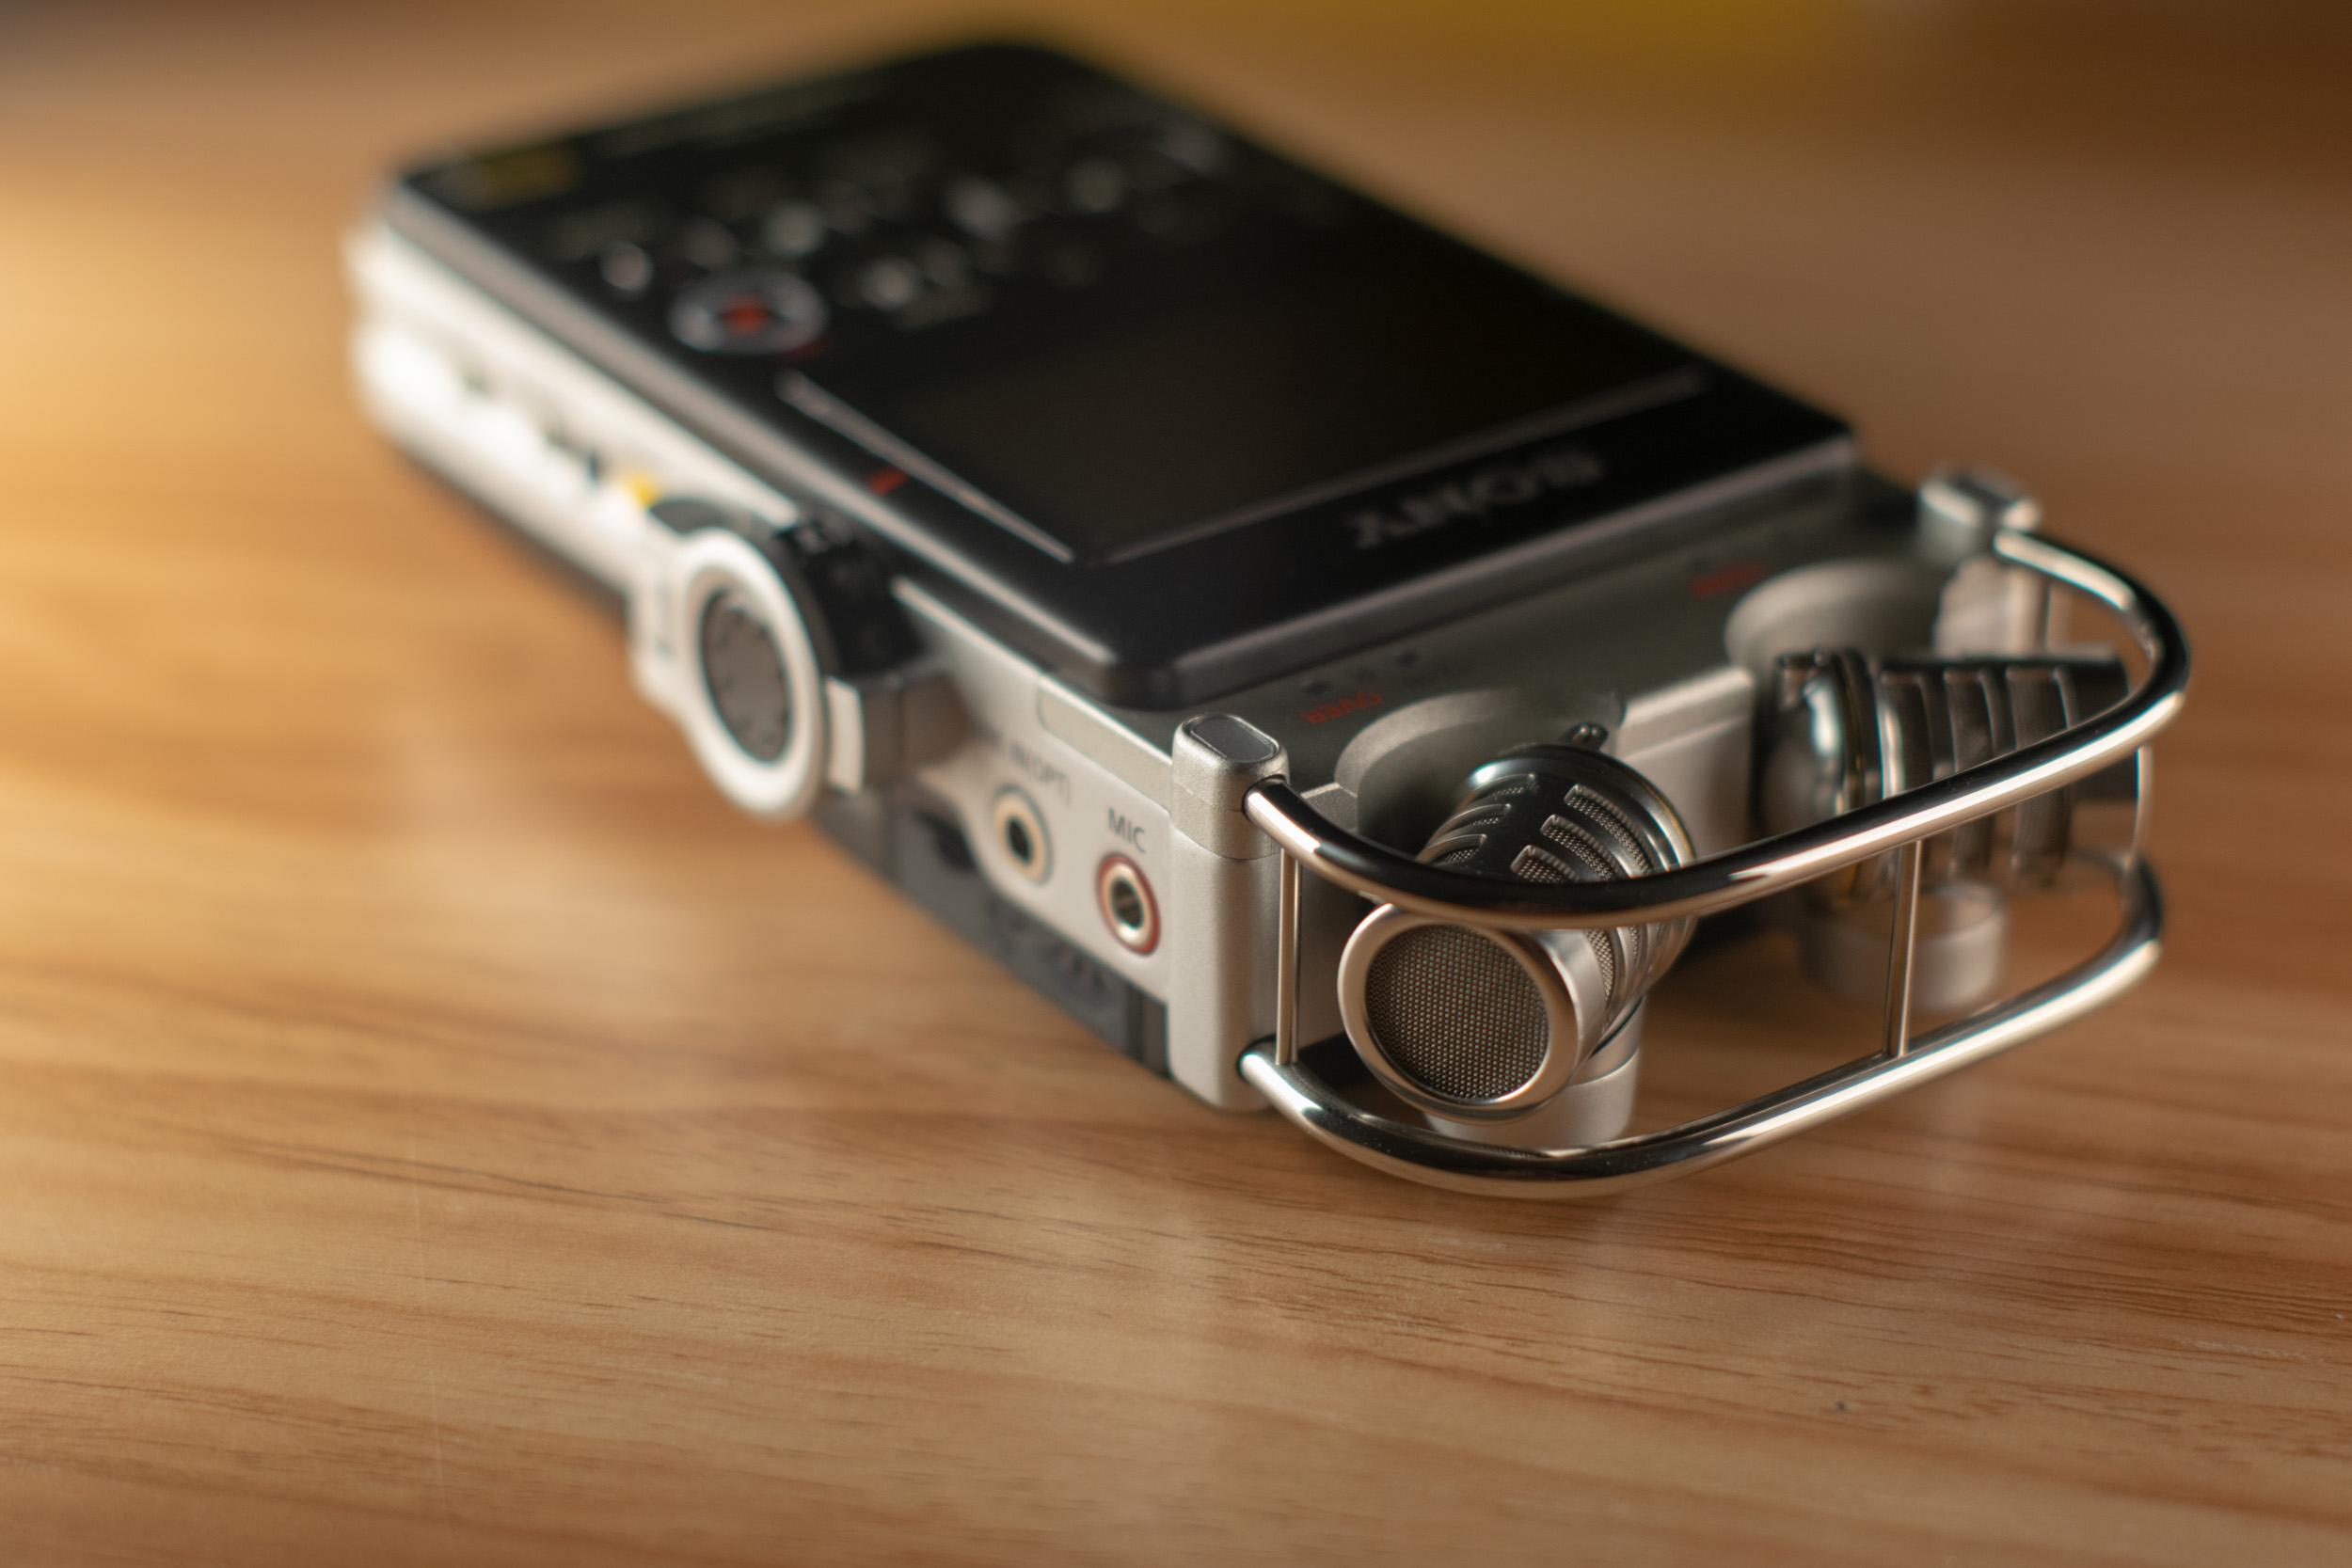 Sony PCM-D100-1  Top View.jpg